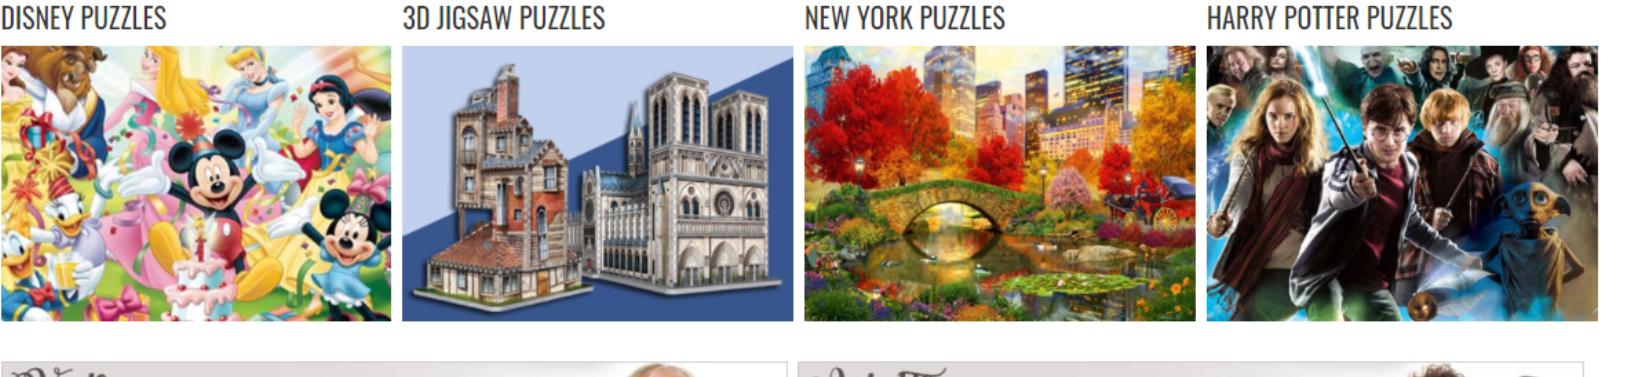 JigsawPuzzle About